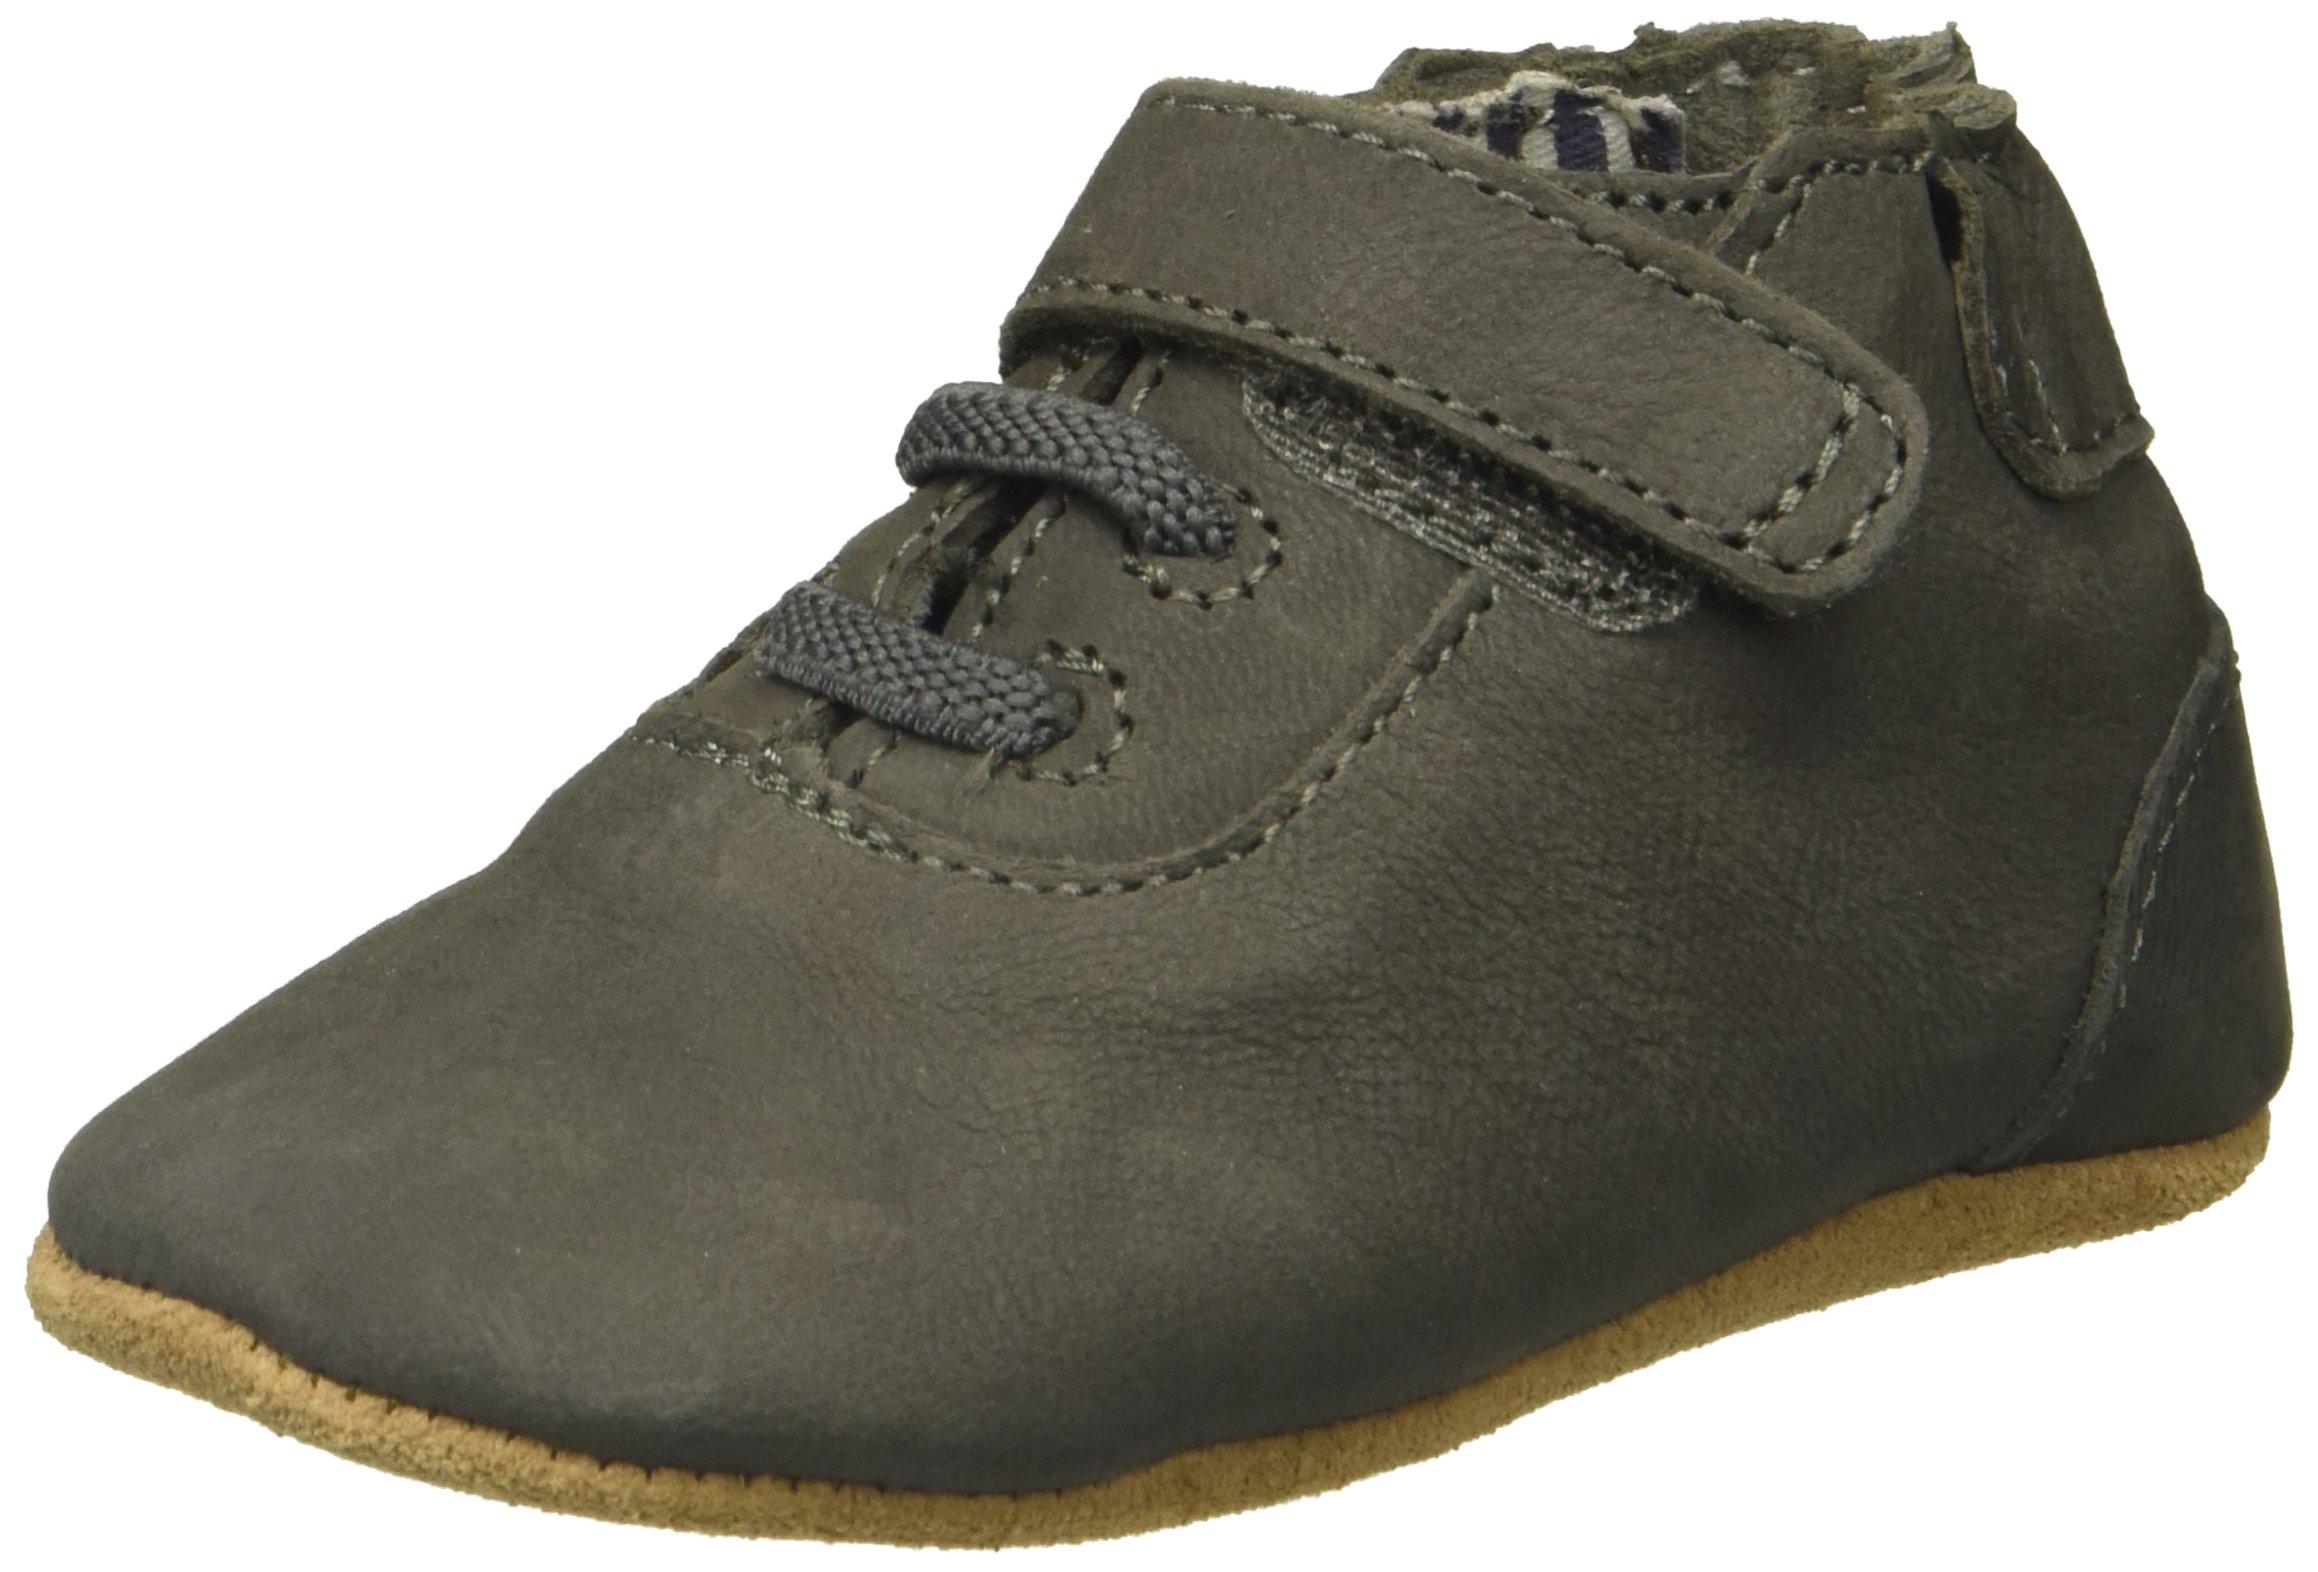 Robeez Boys' George Shoe First Kicks,Grey,12-18 mn M US Infant